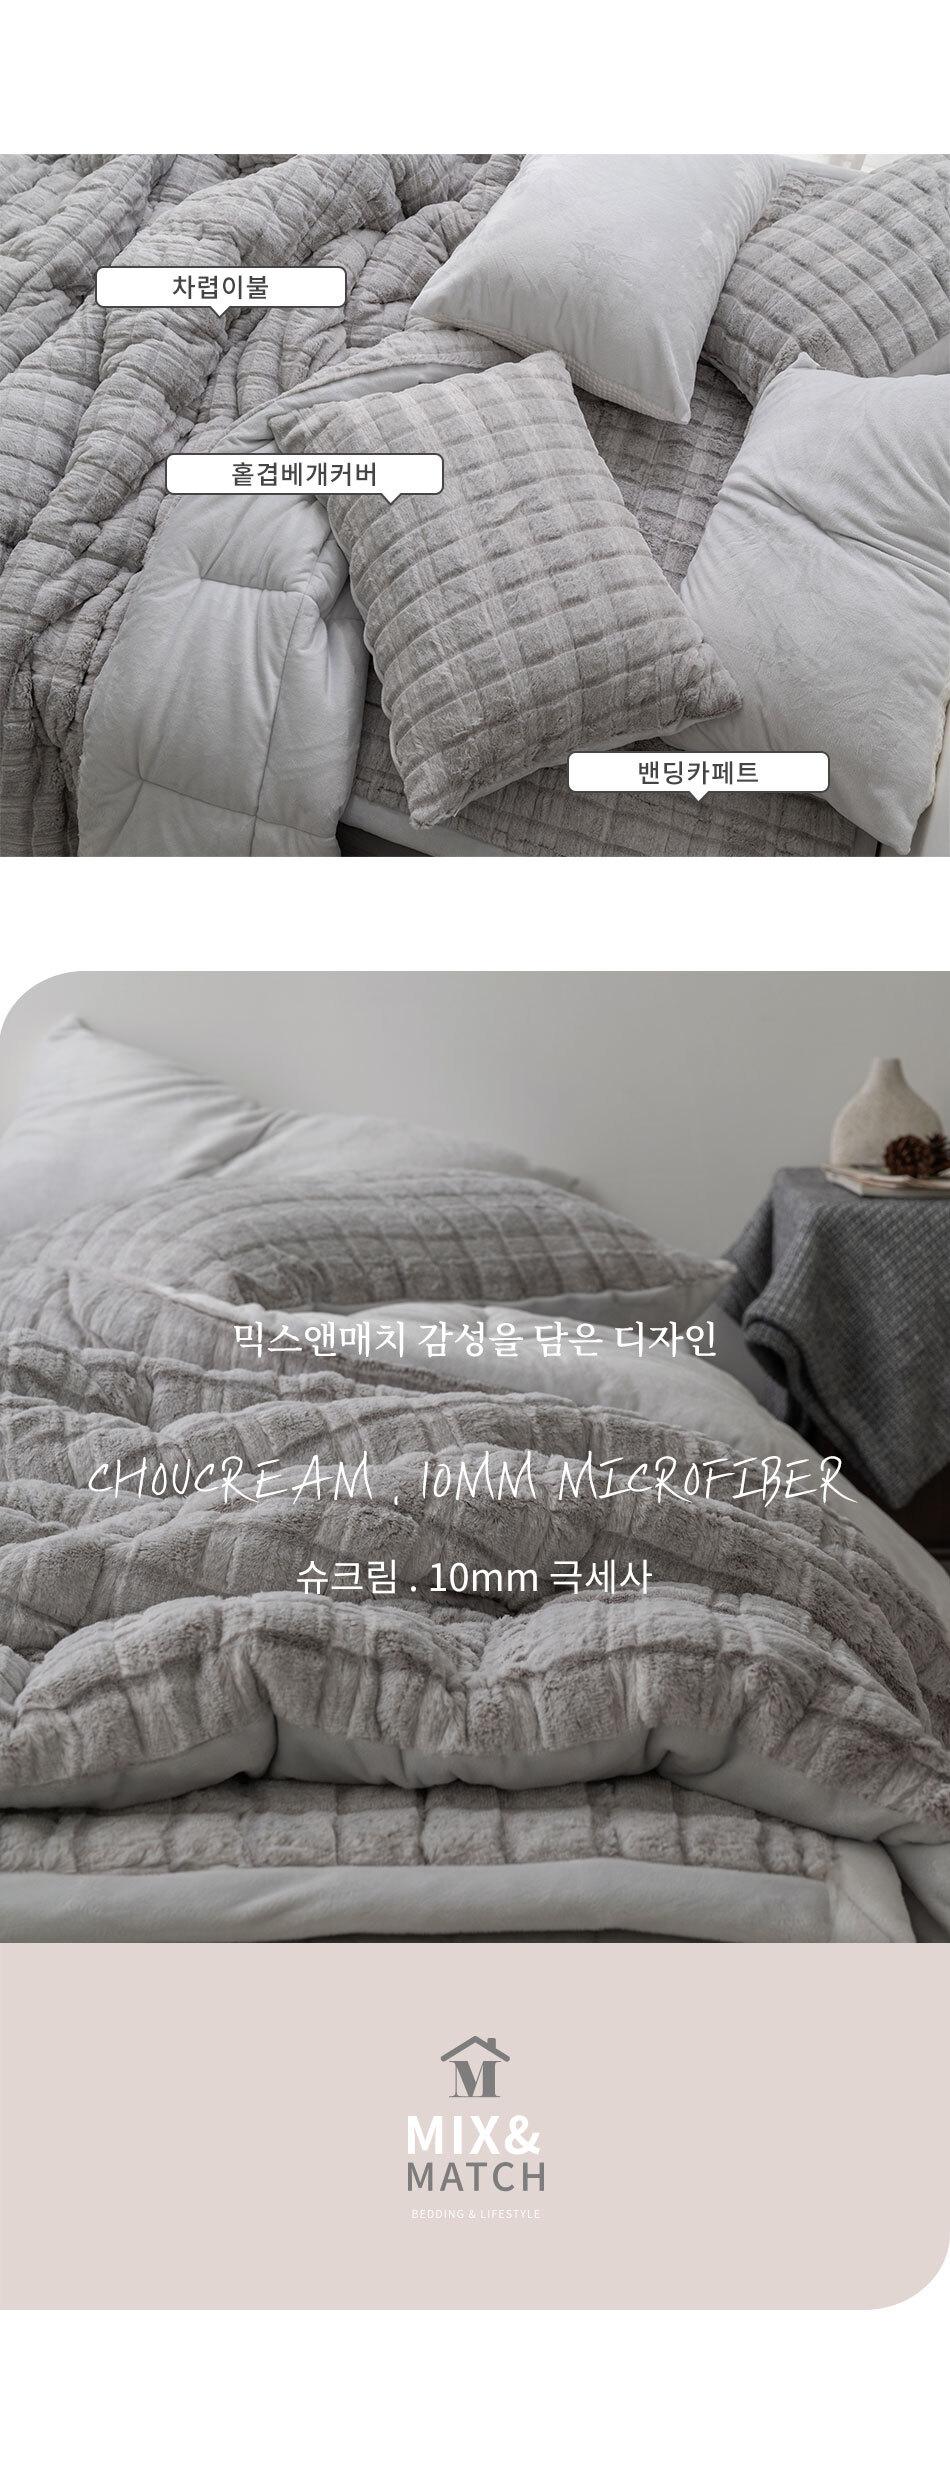 chou_bed_bottom.jpg